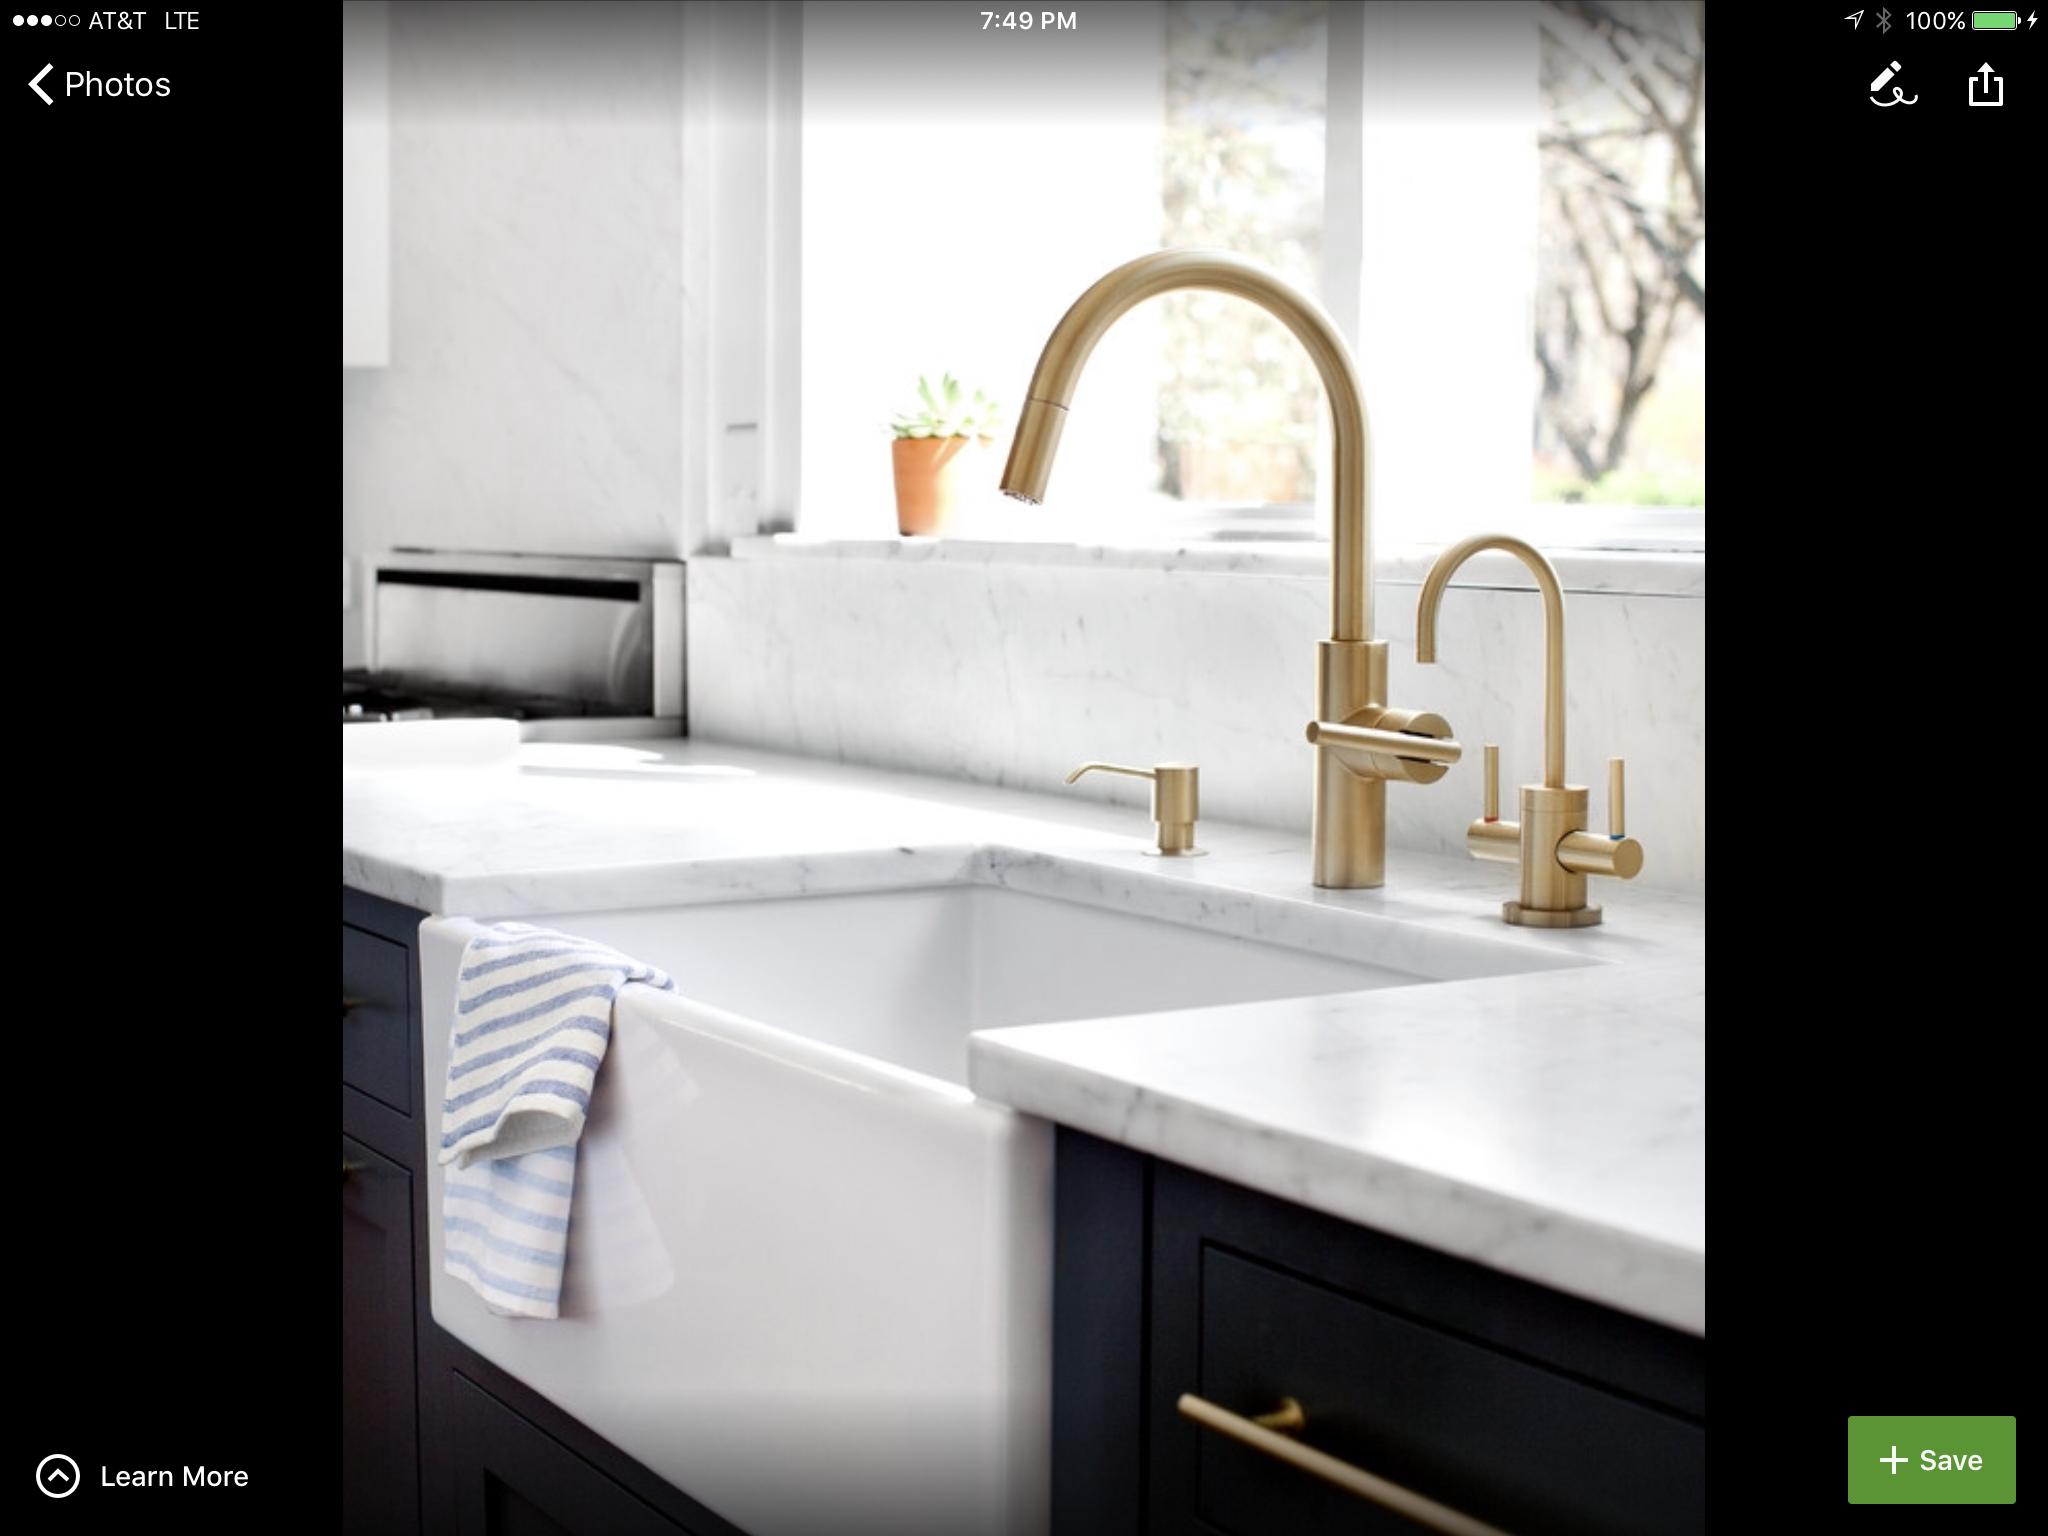 Antique Brass Vintage Kitchen Faucet With Farm Sink .